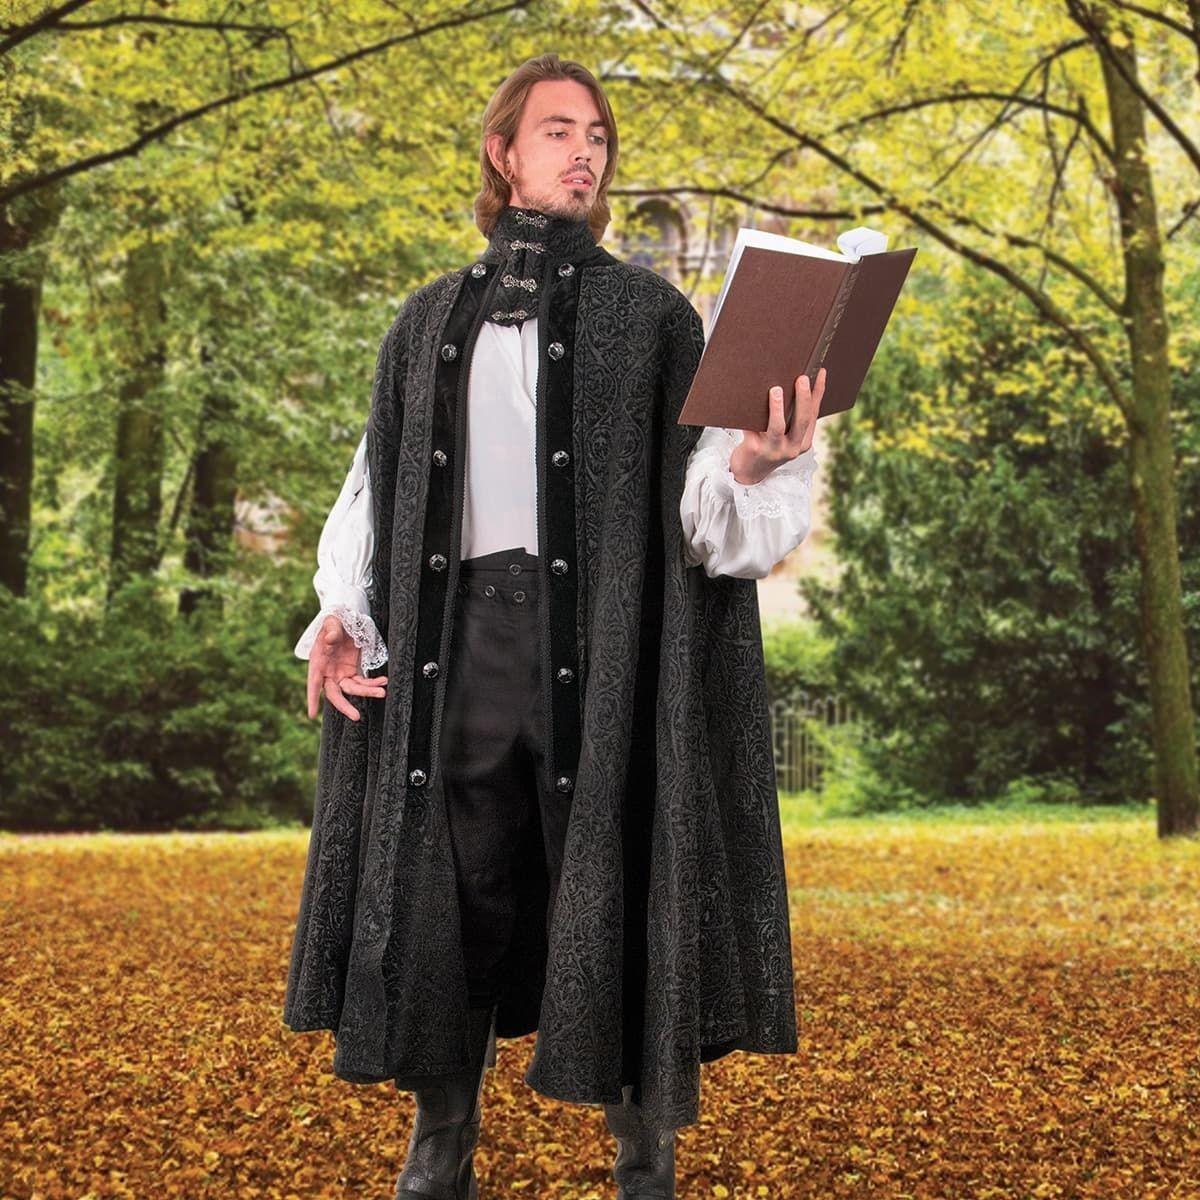 Stratford Brocade Cloak